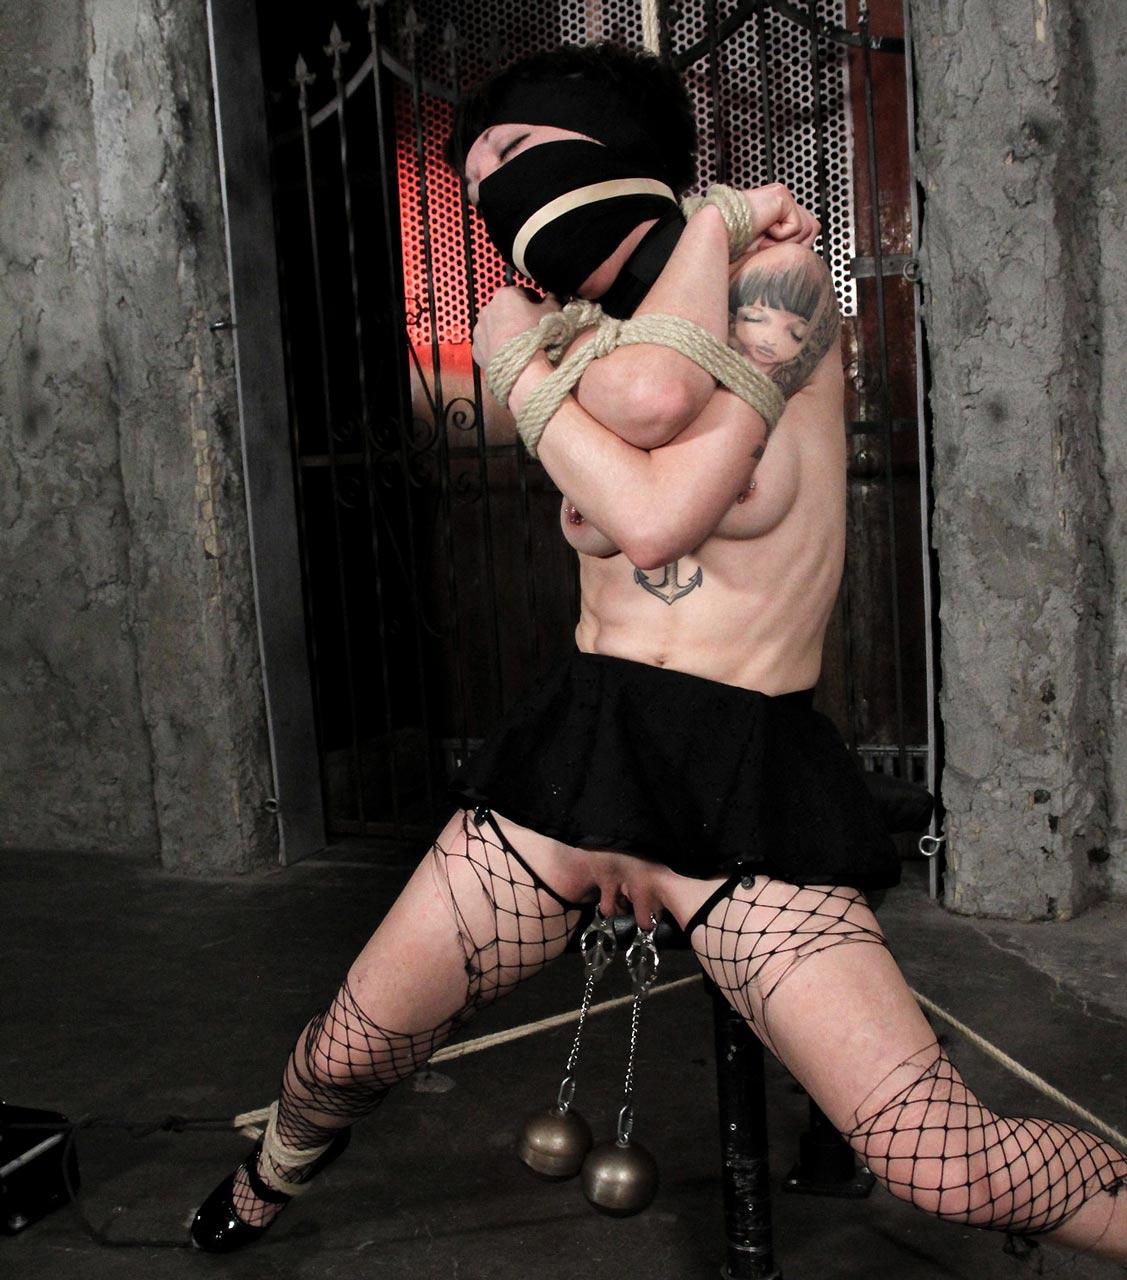 BDSM | Bondage, Discipline, Dominance, Submission, SadoMasochism.